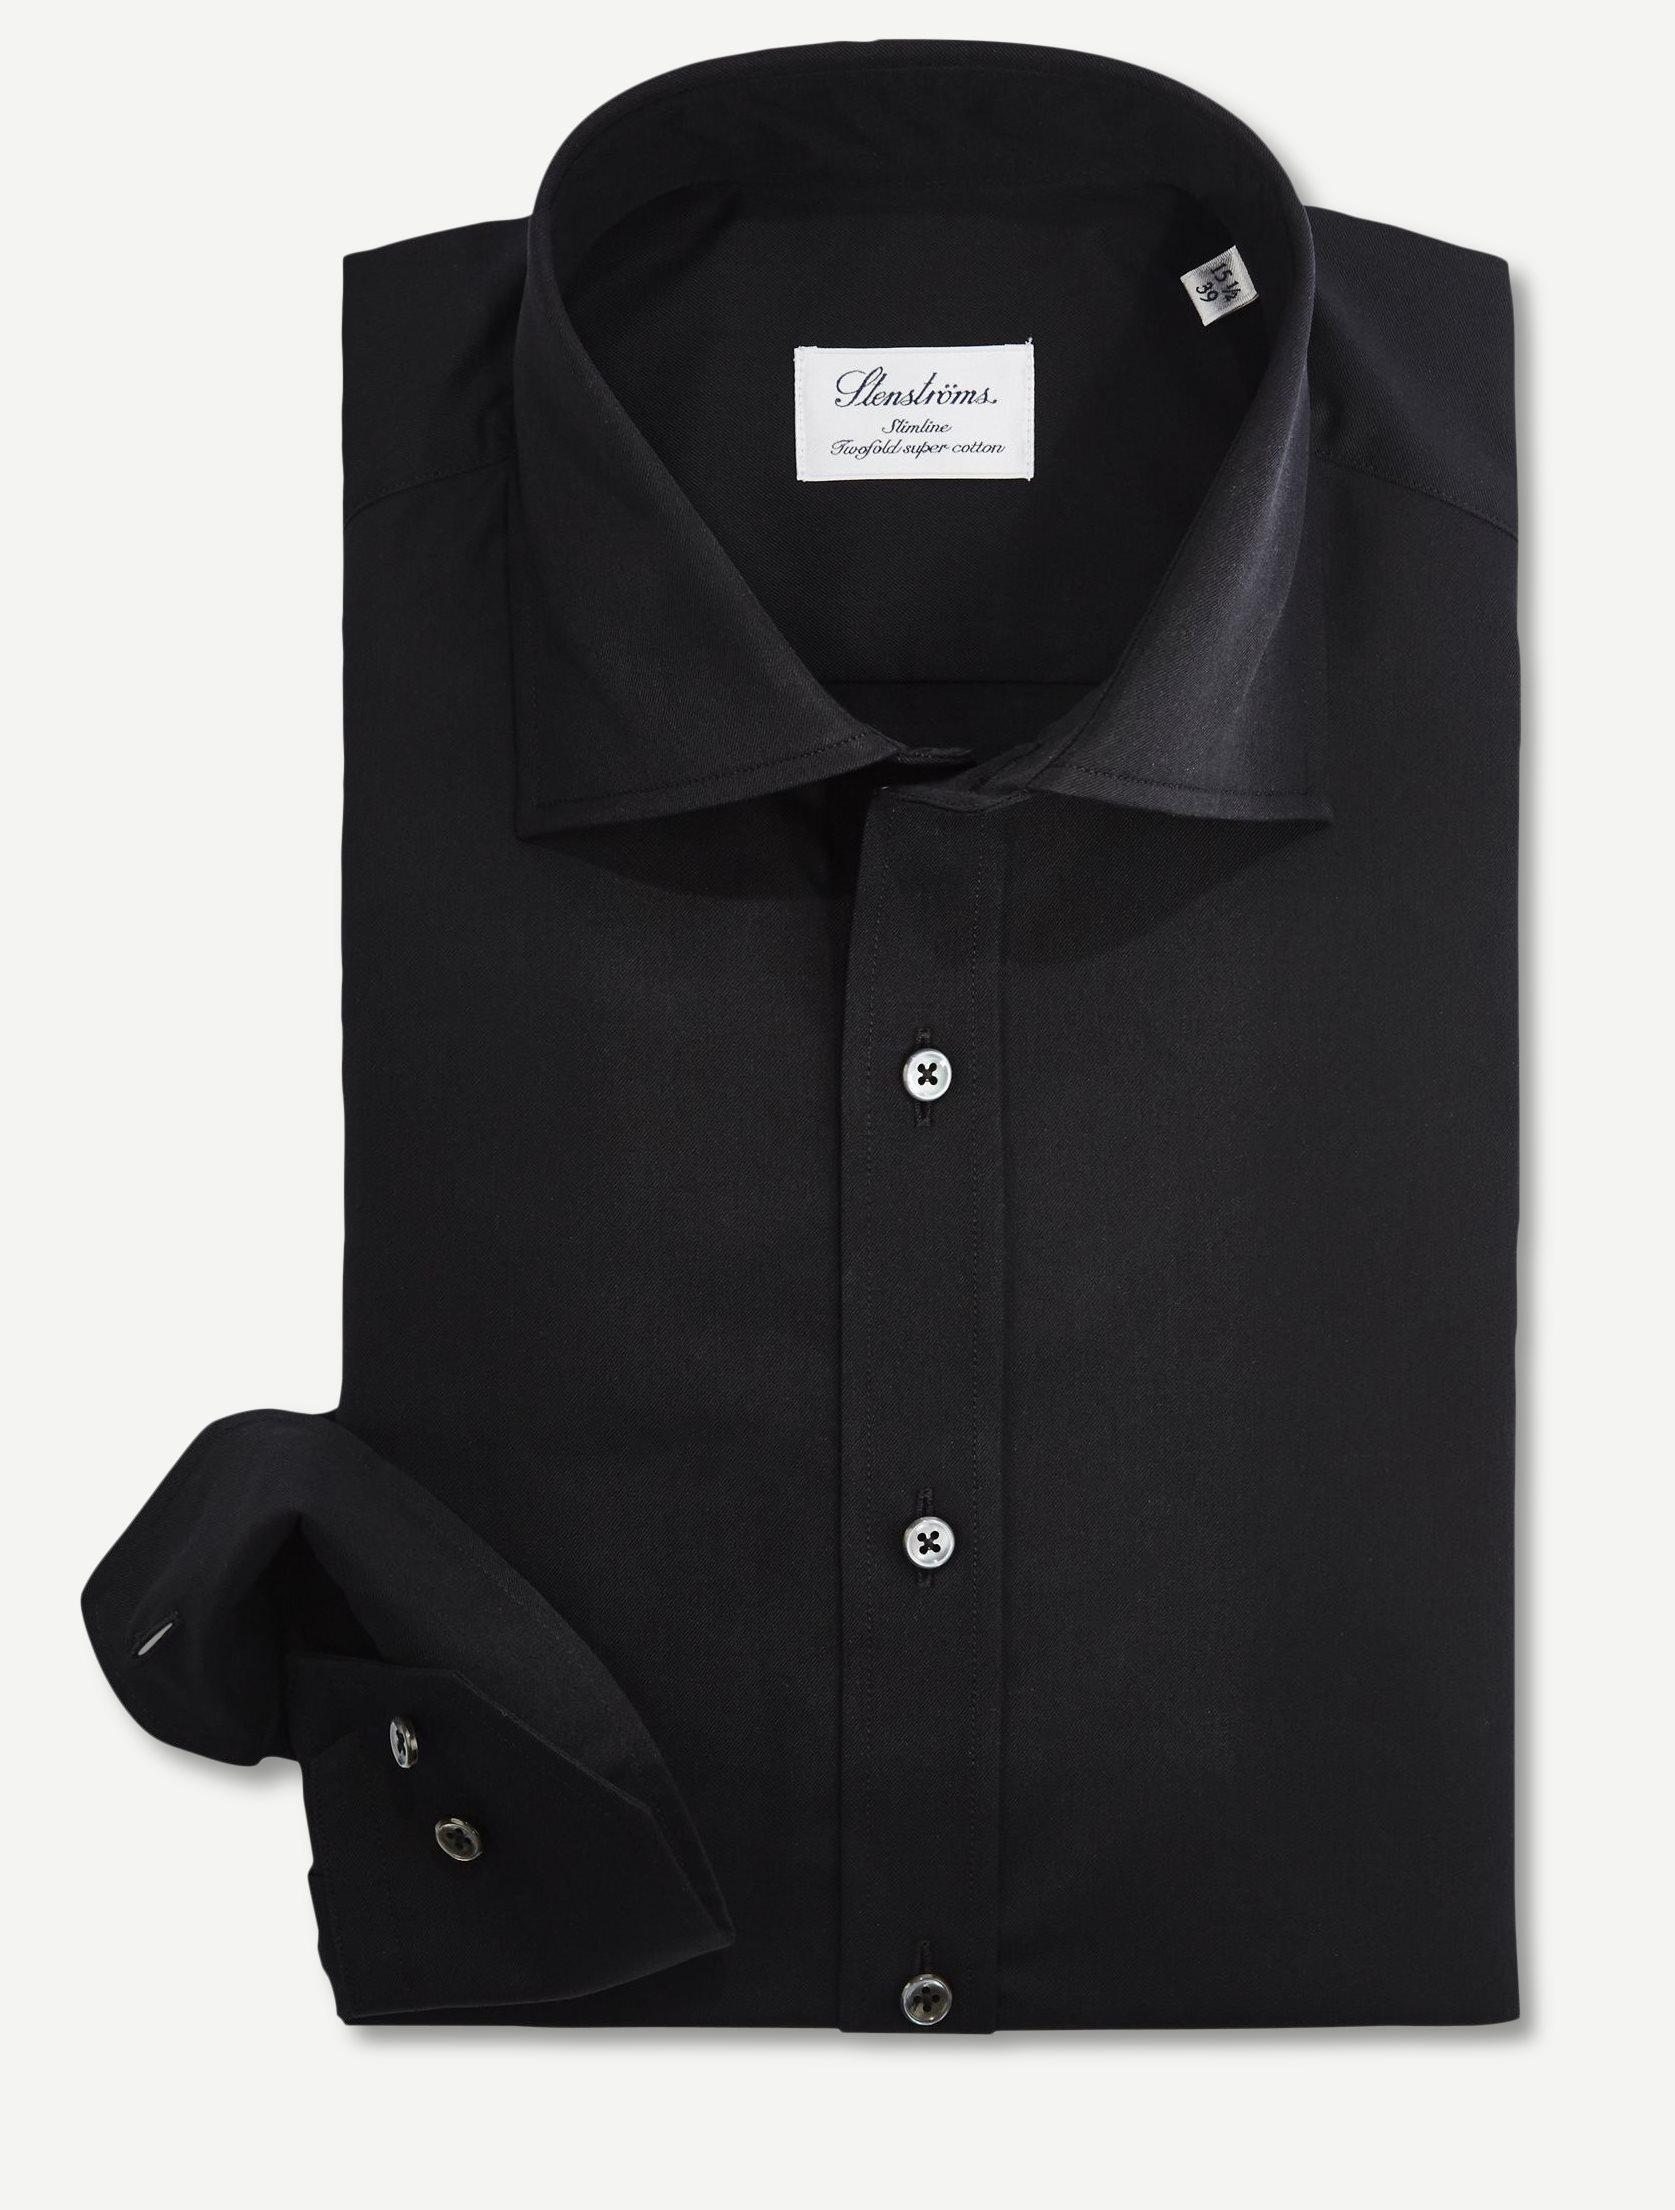 Dress Skjorte - Skjorter - Slim fit - Sort